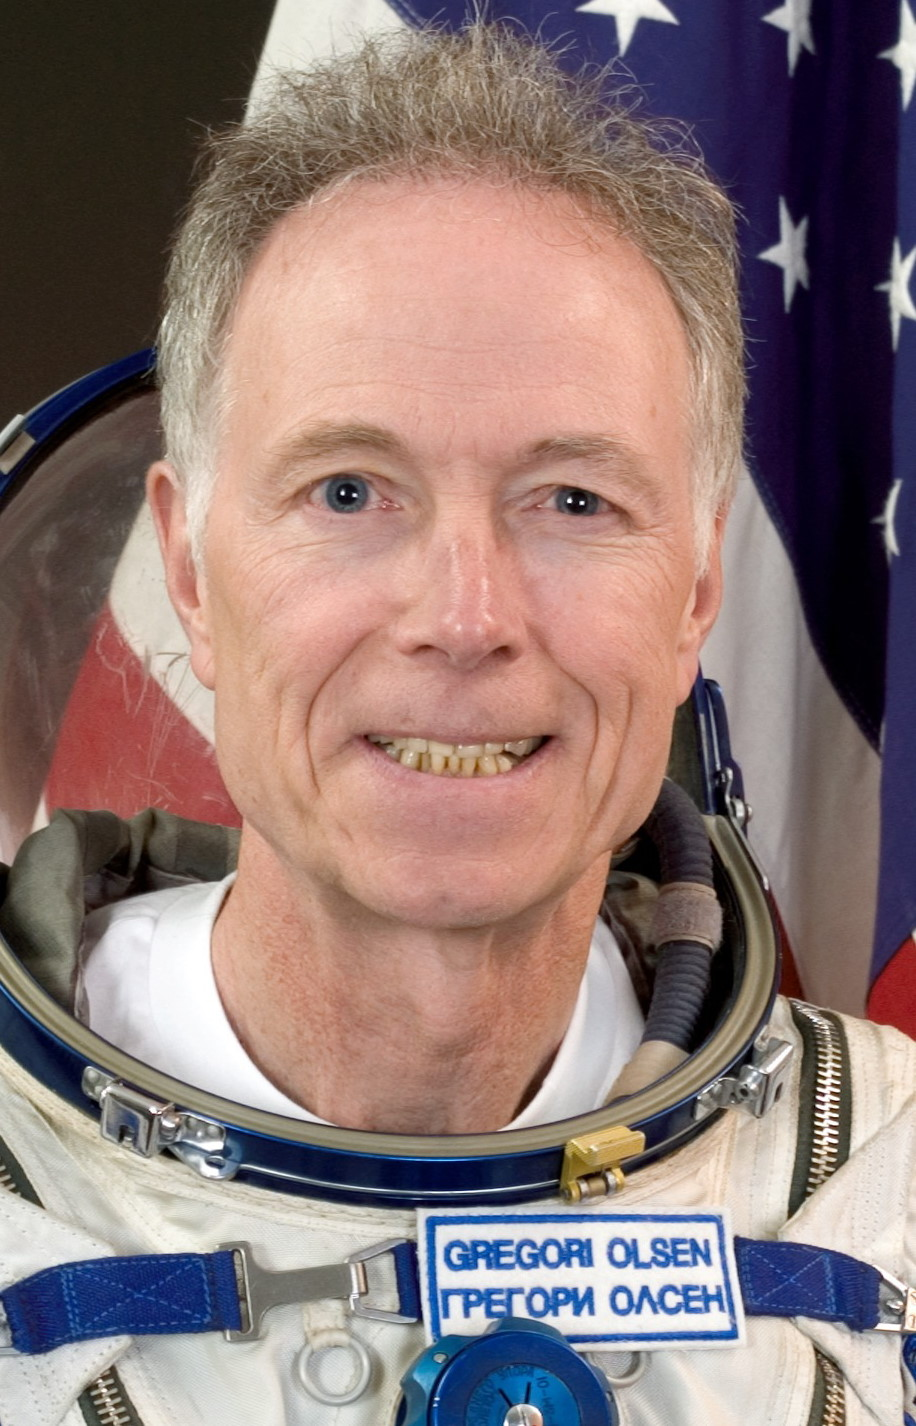 Astronaut Biography Gregory Olsen